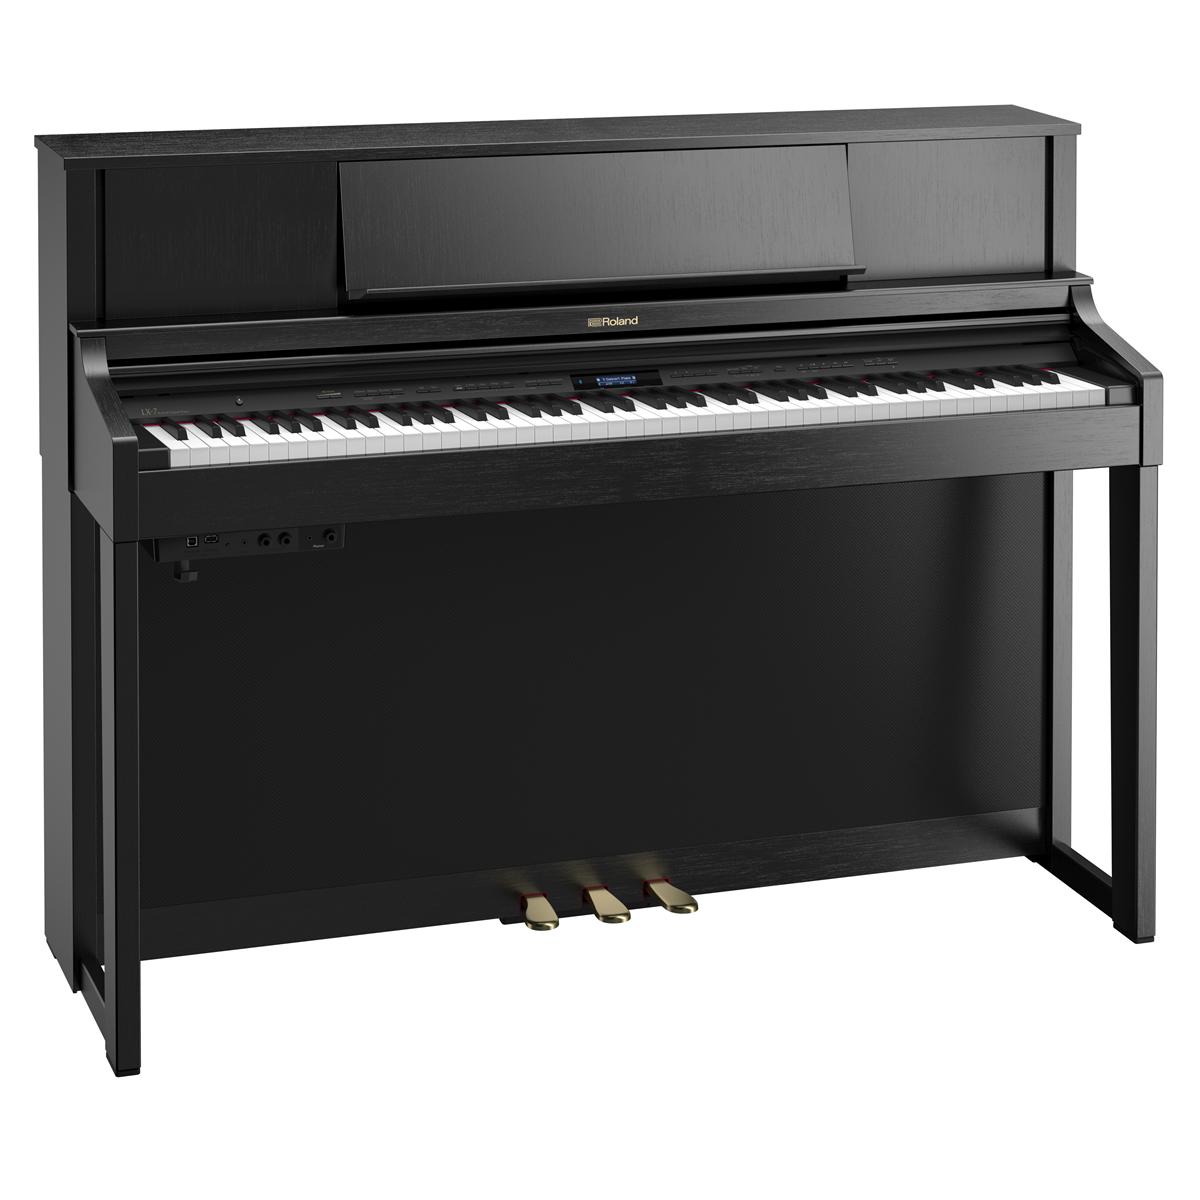 Roland LX-7 - € 3499